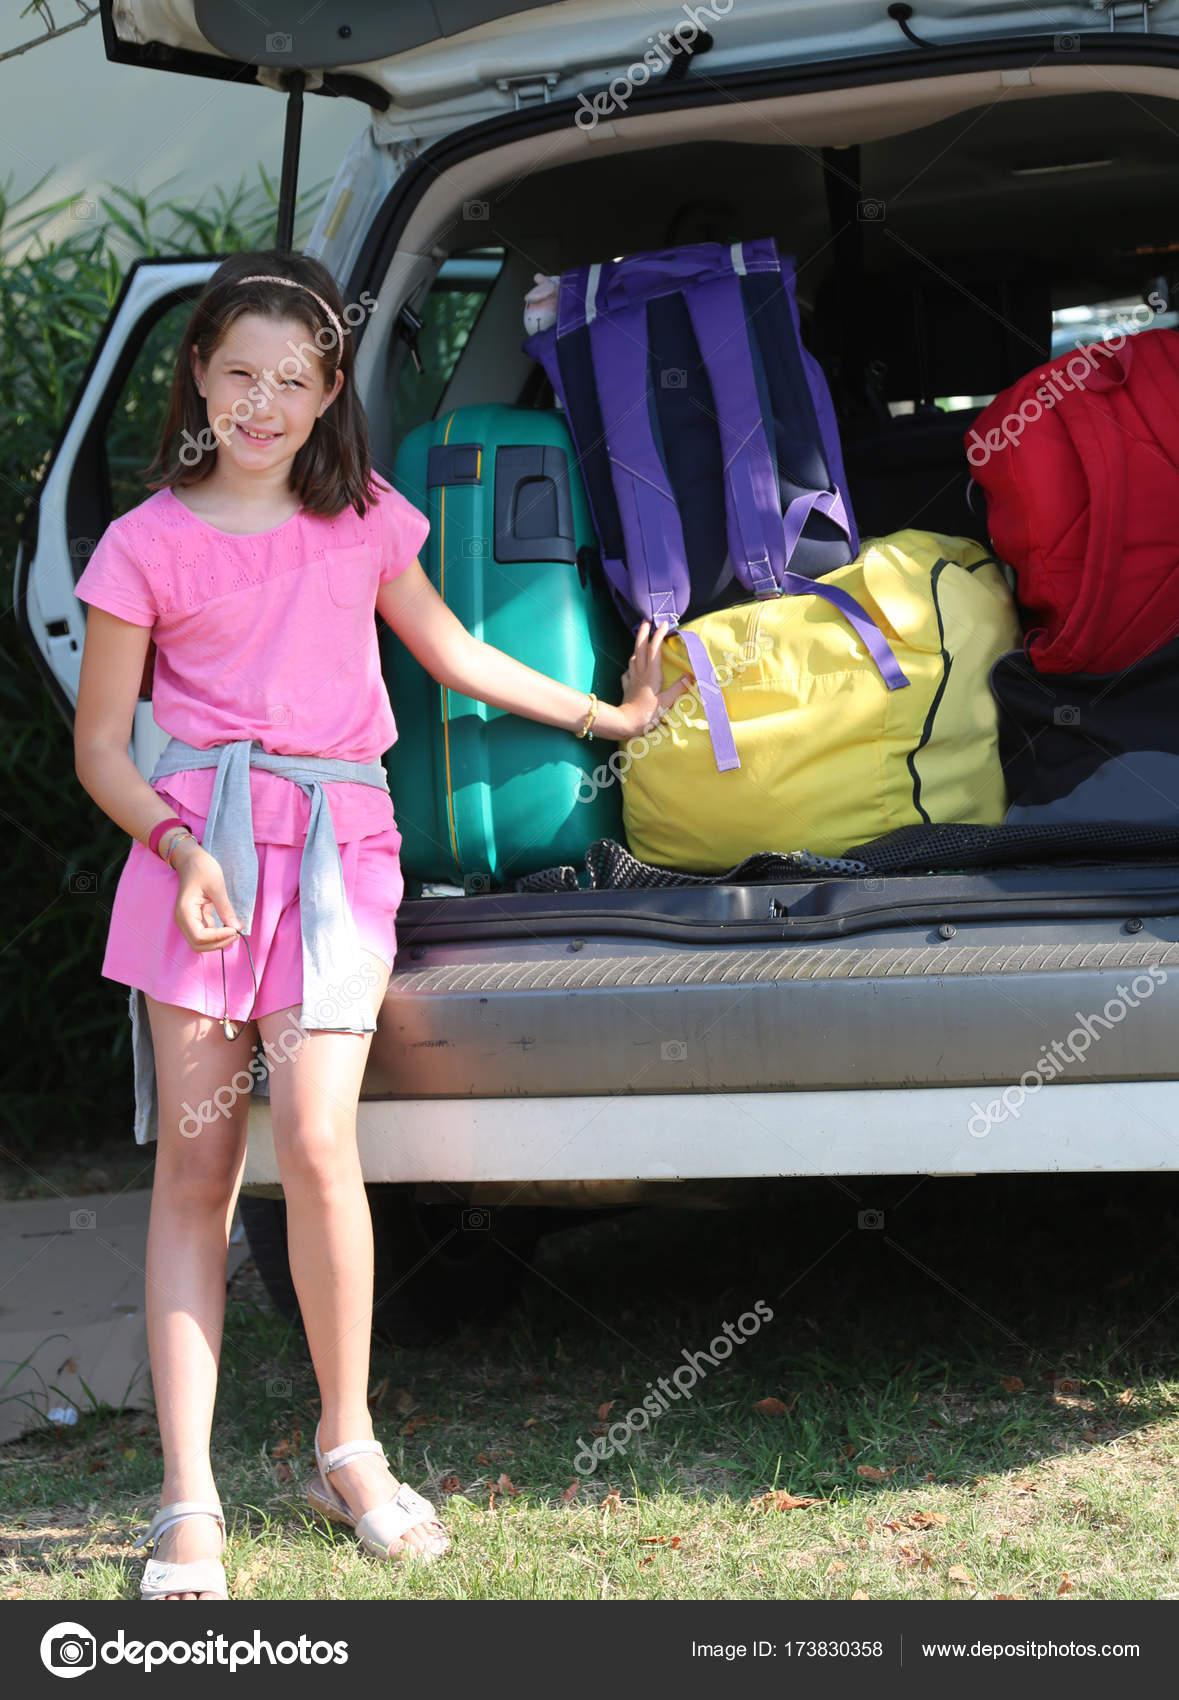 jolie petite fille robe rose charge des valises sur la voiture photographie chiccododifc. Black Bedroom Furniture Sets. Home Design Ideas